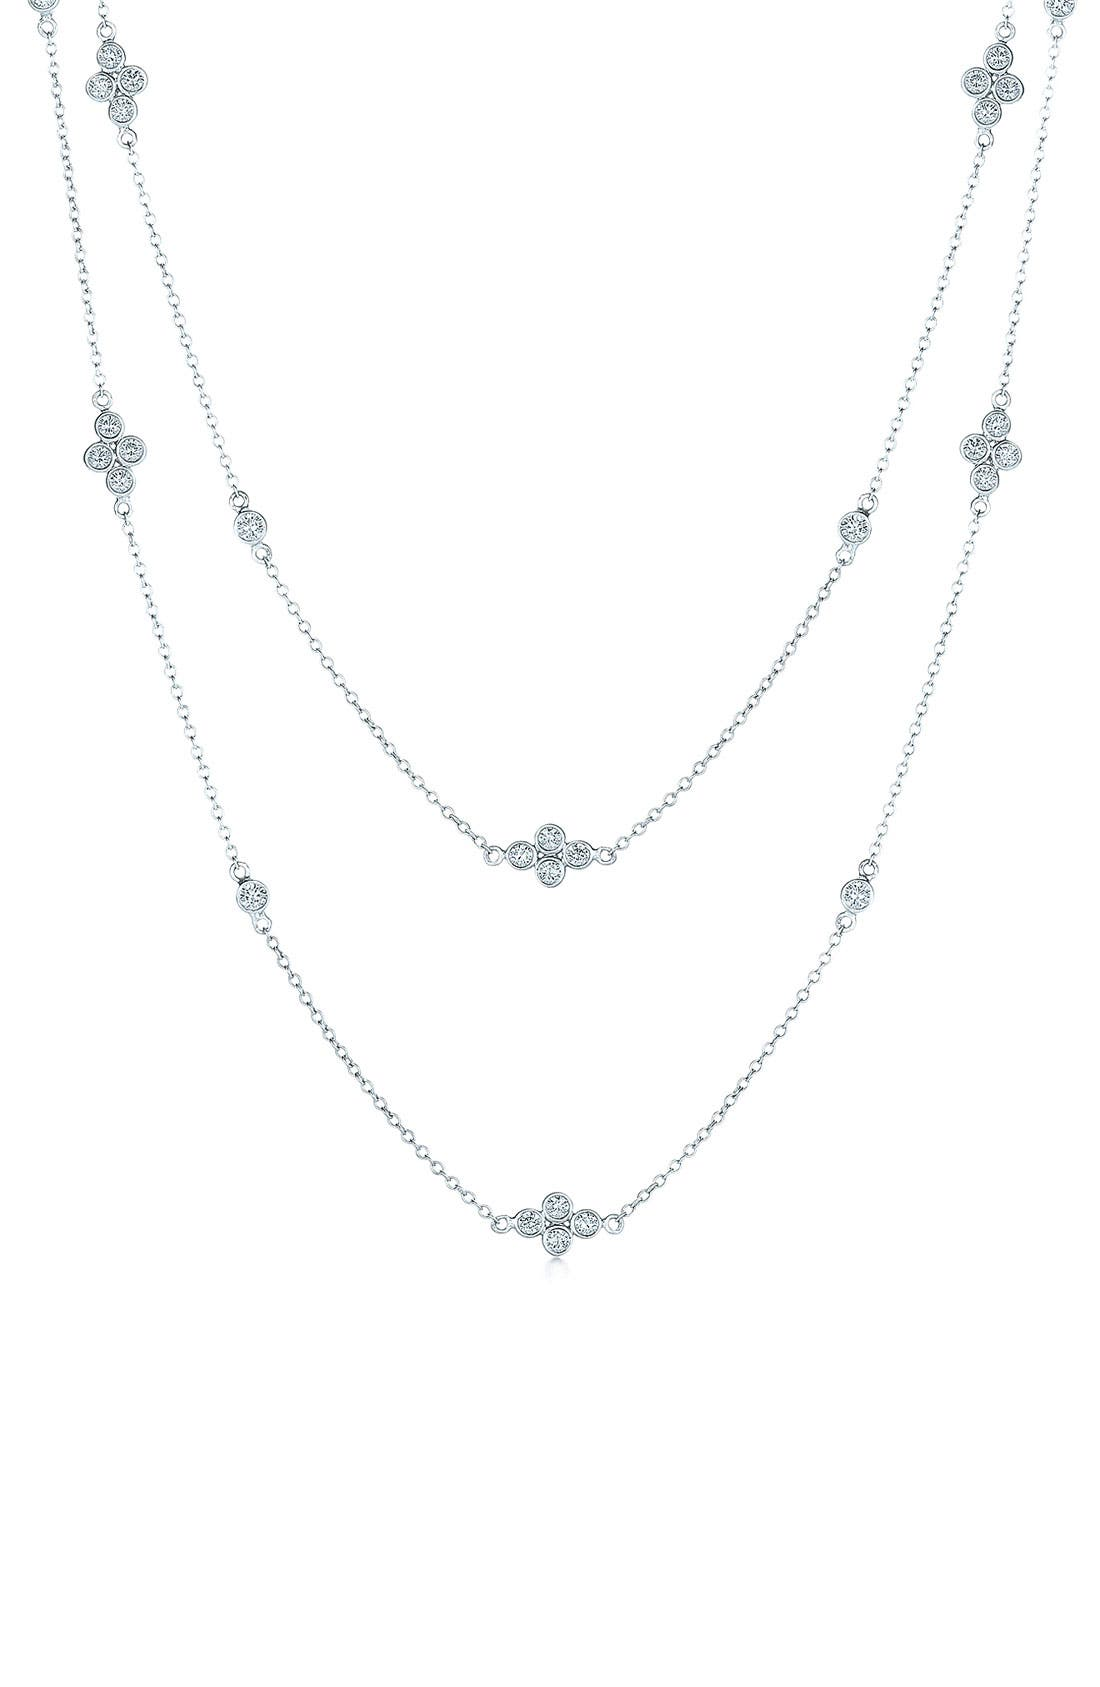 'Diamond Strings' Long Diamond Station Necklace,                             Main thumbnail 1, color,                             WHITE GOLD